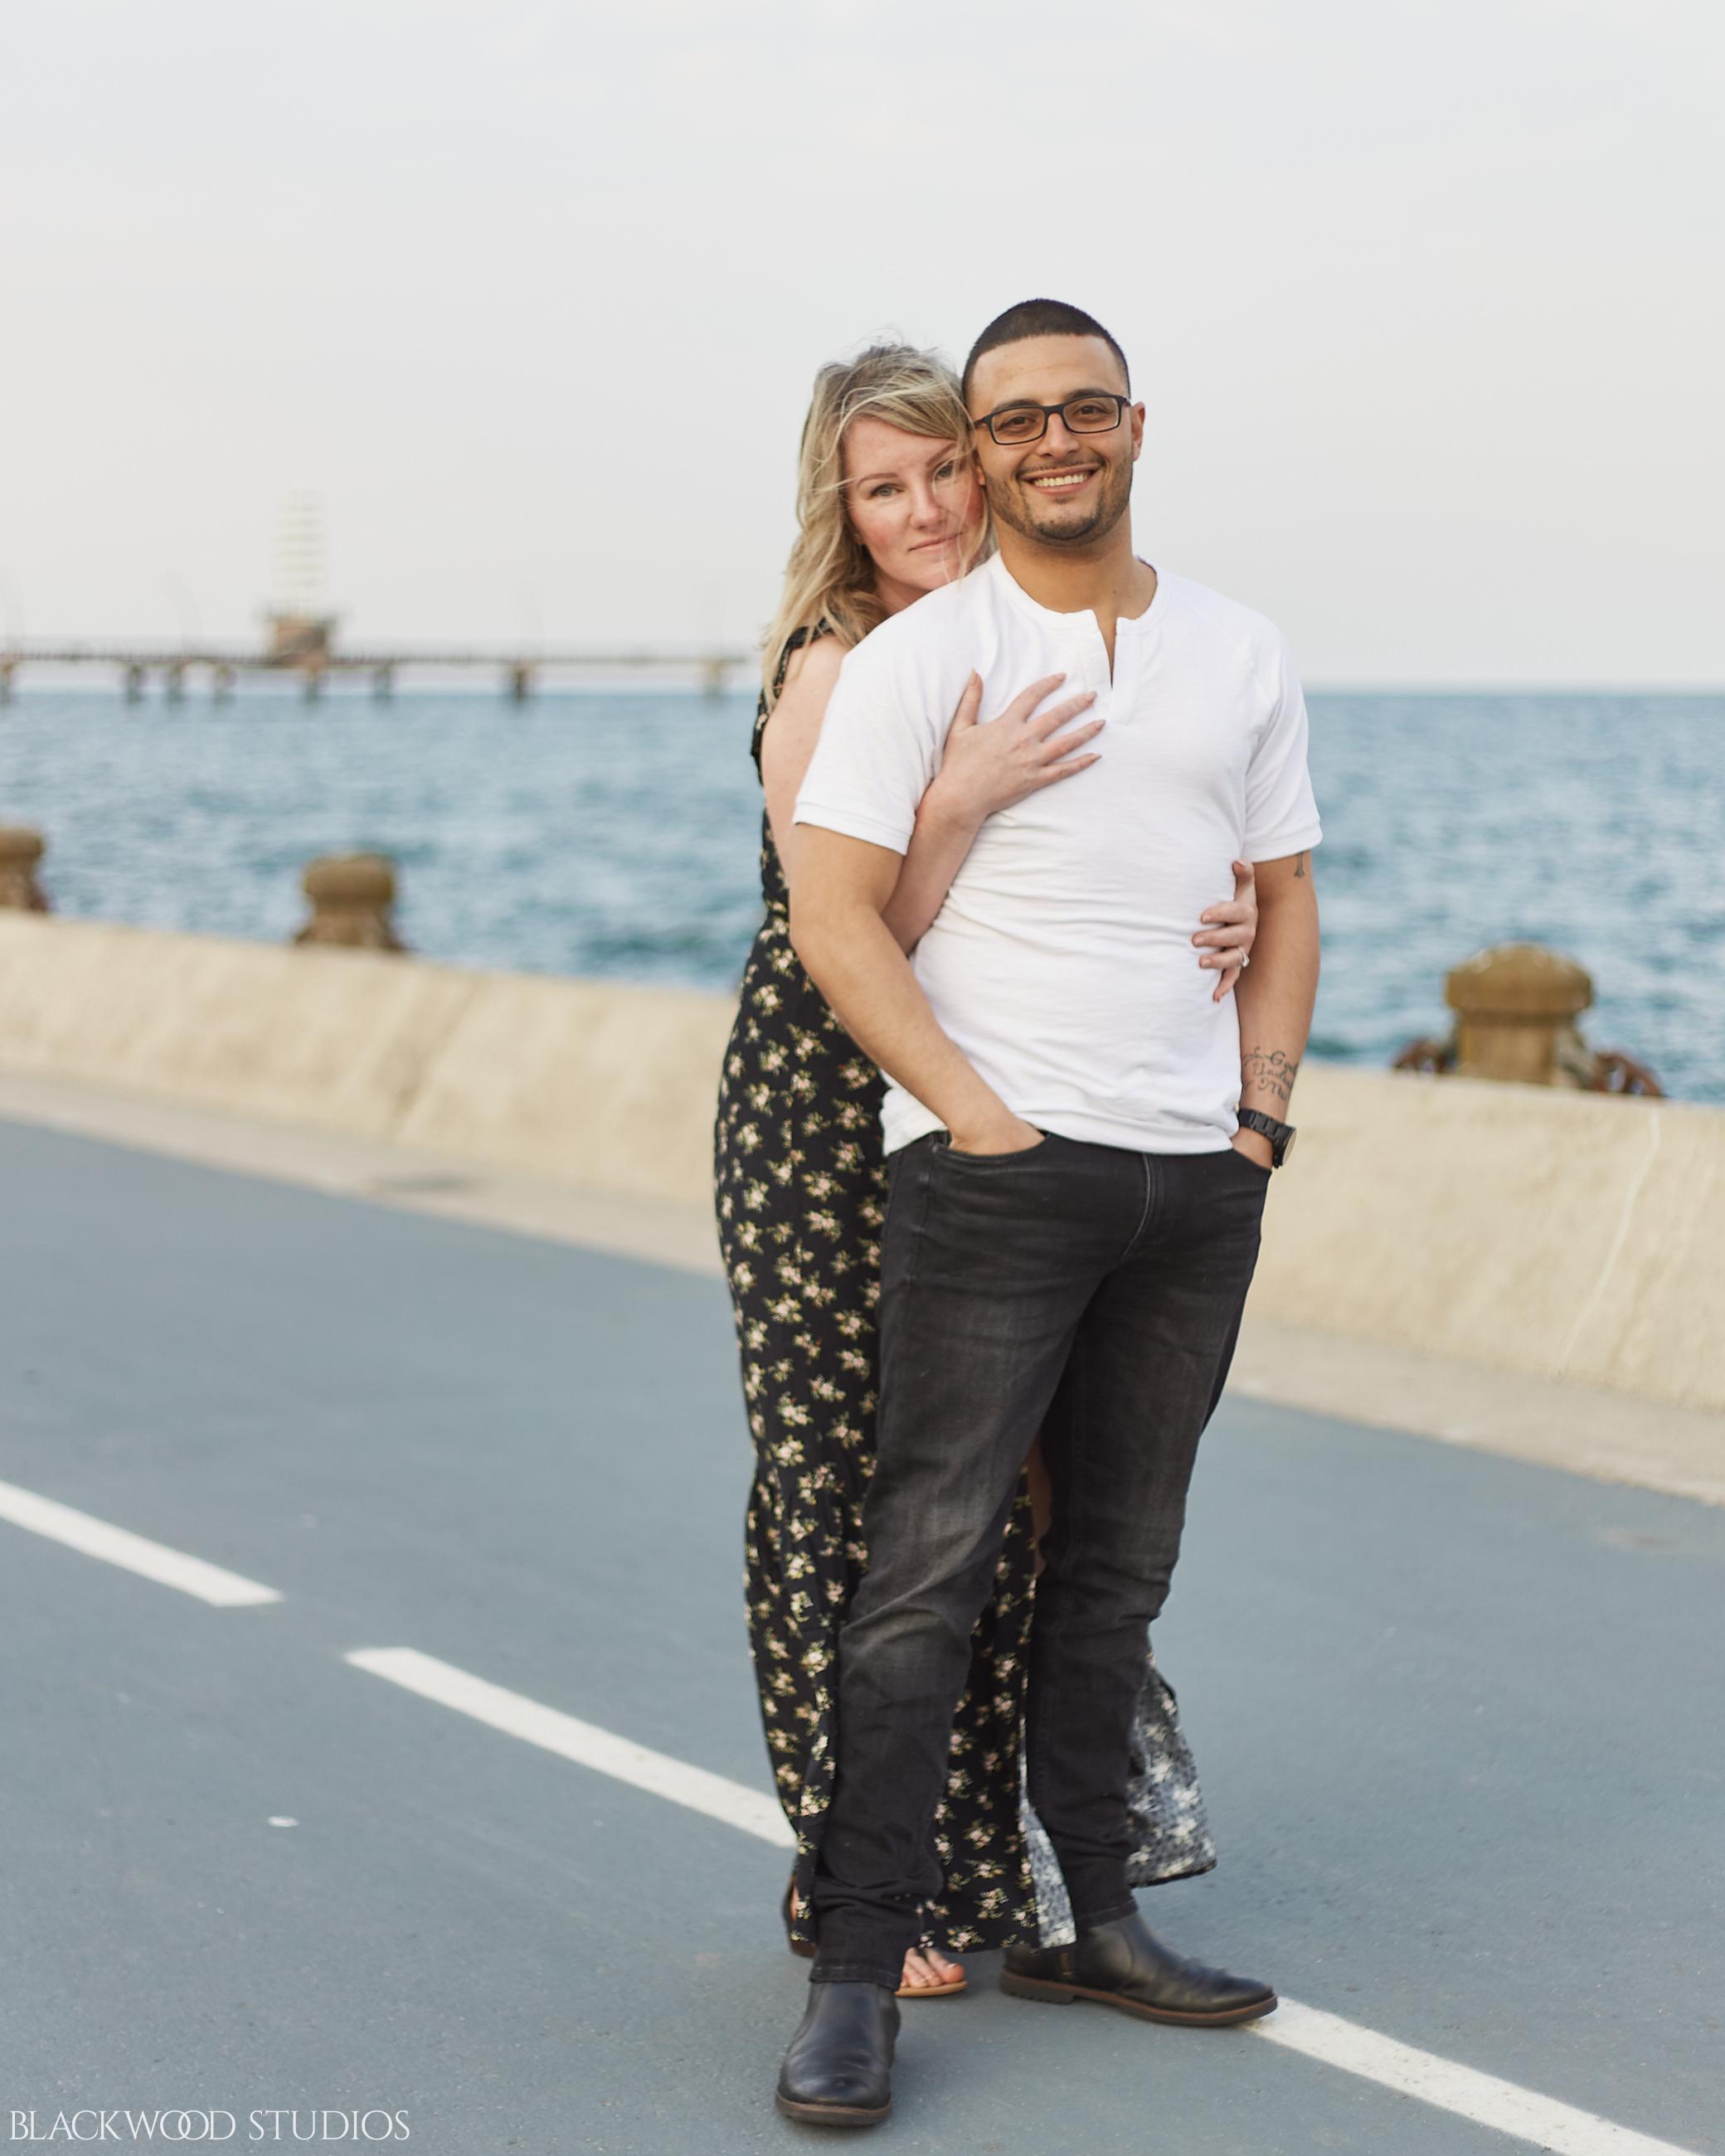 Blackwood-Studios-Photography-20190604195931-Shannon-and-Pedro-Engagement-Spencer-Smith-Park-Burlington-Ontario-Canada.jpg